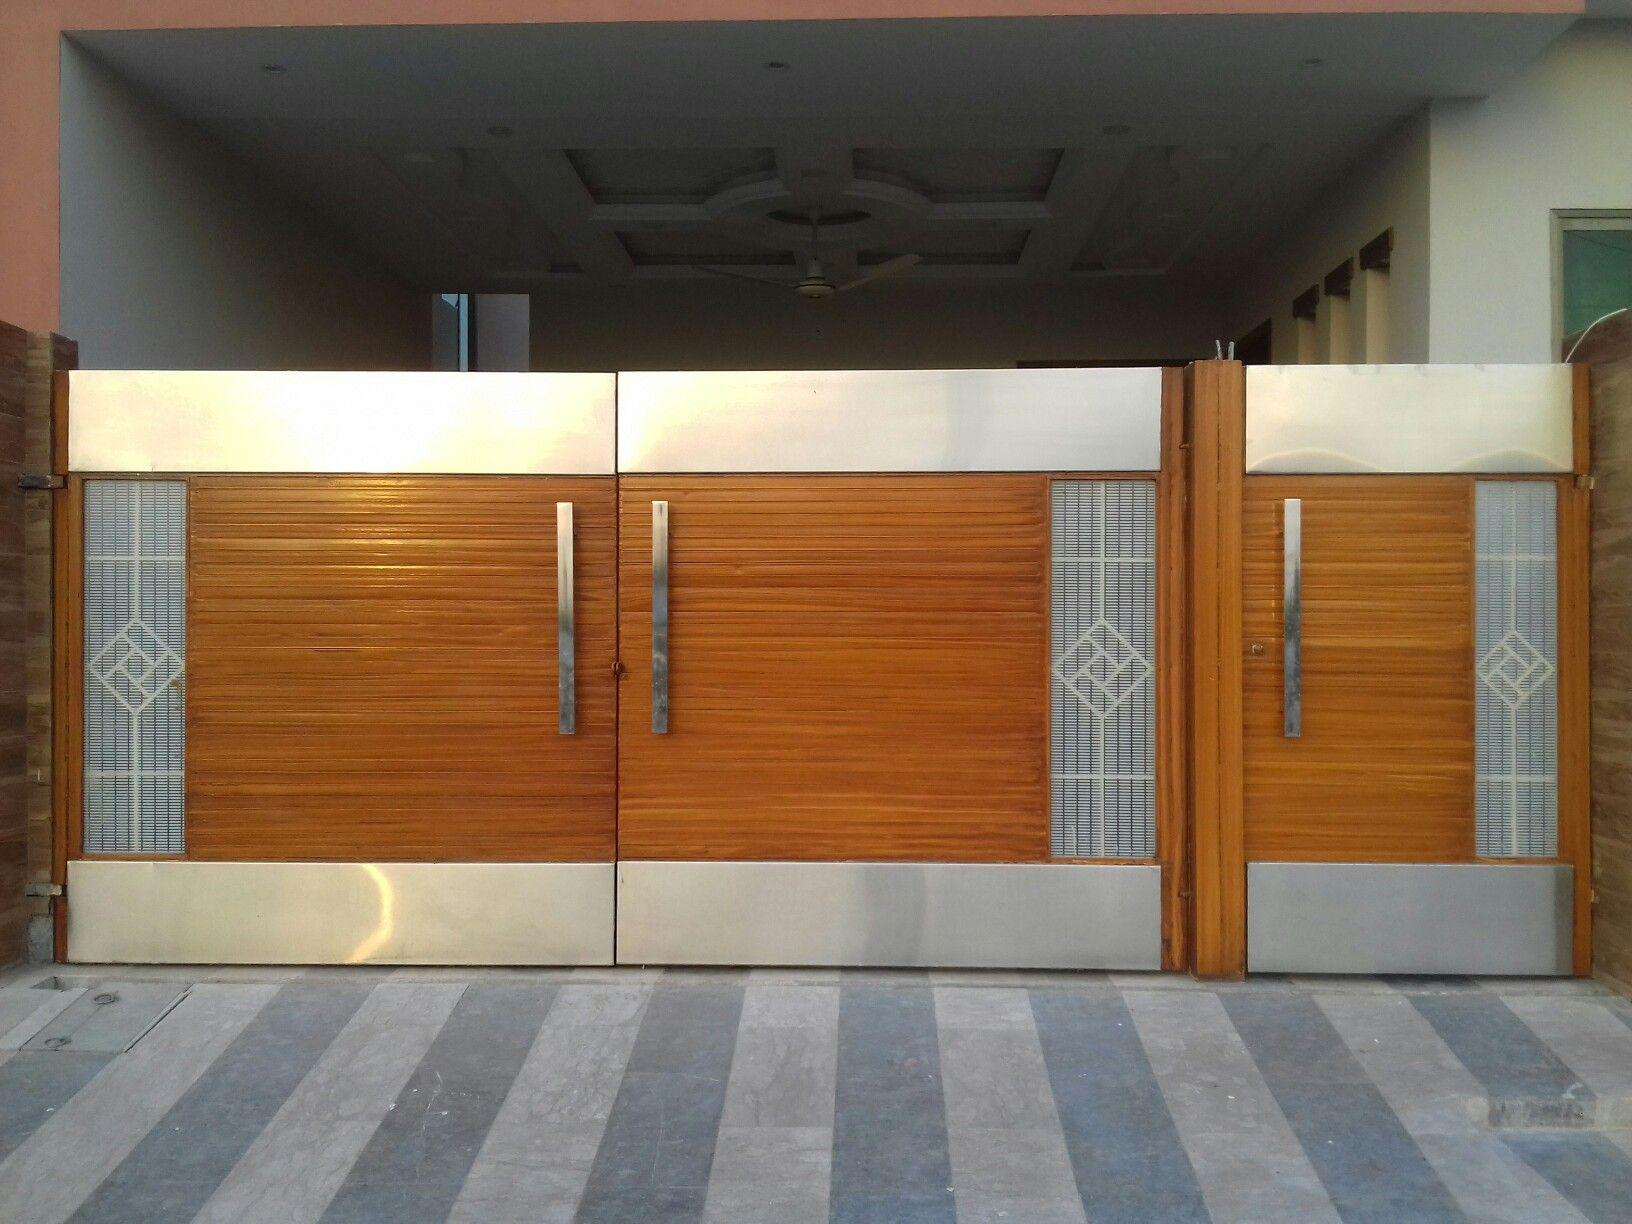 Iron gate multan pakistan steel design main front gates also syed muhammad abbasptcl on pinterest rh